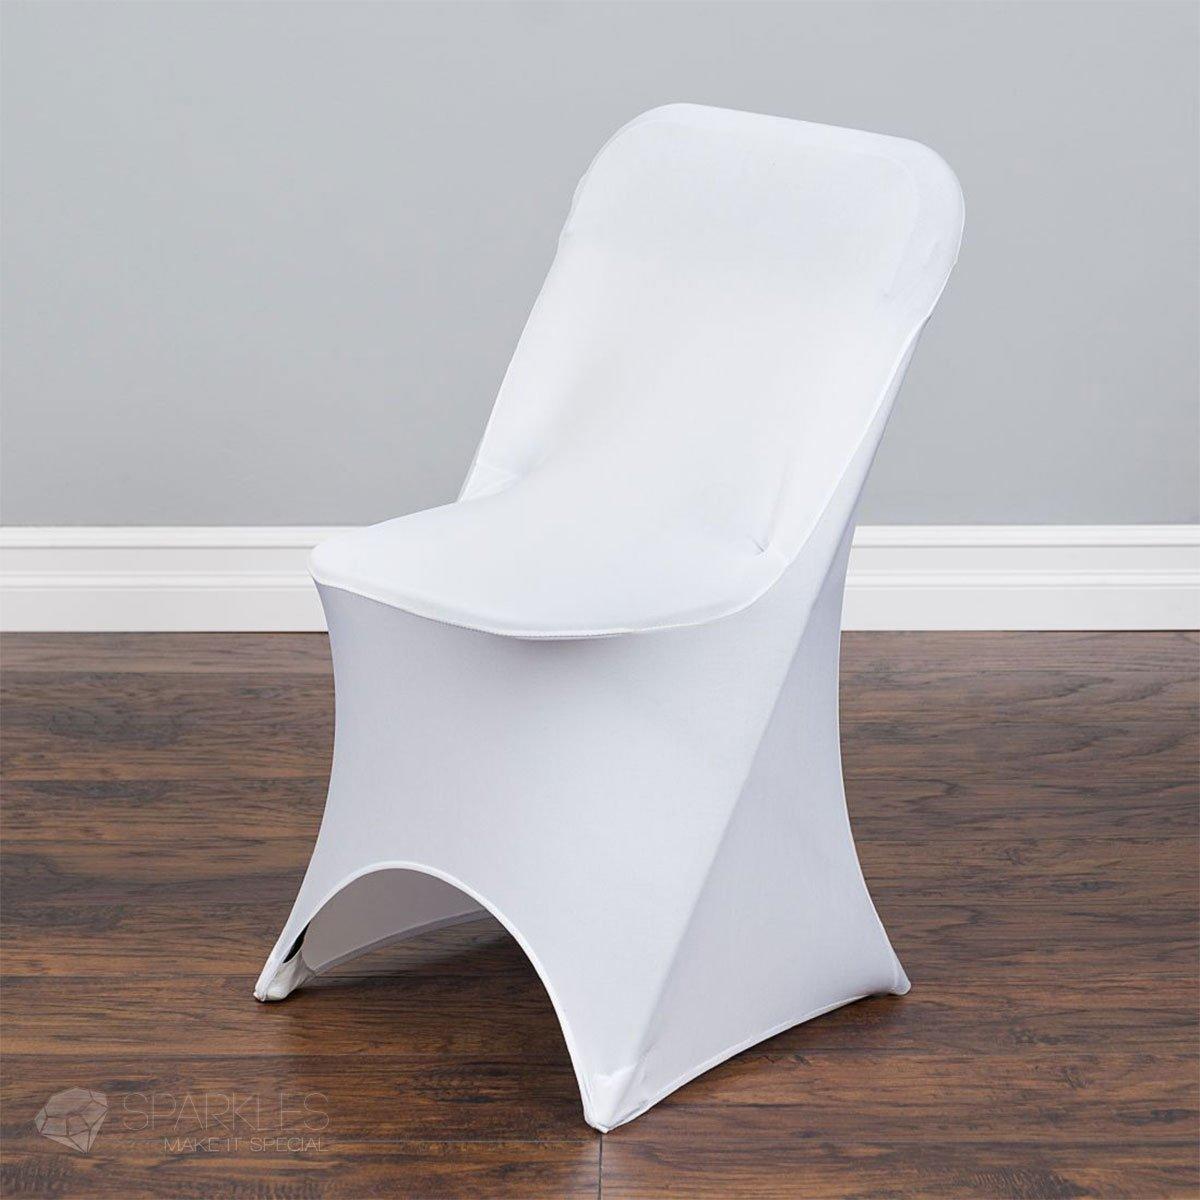 Sparkles Make It特別なスパンデックス椅子折りたたみアーチ型前面カバー – ウェディング披露宴宴会パーティーレストランユニバーサルフィット – Choice Of色 ホワイト 4093532249  ホワイト B076X1H8SY